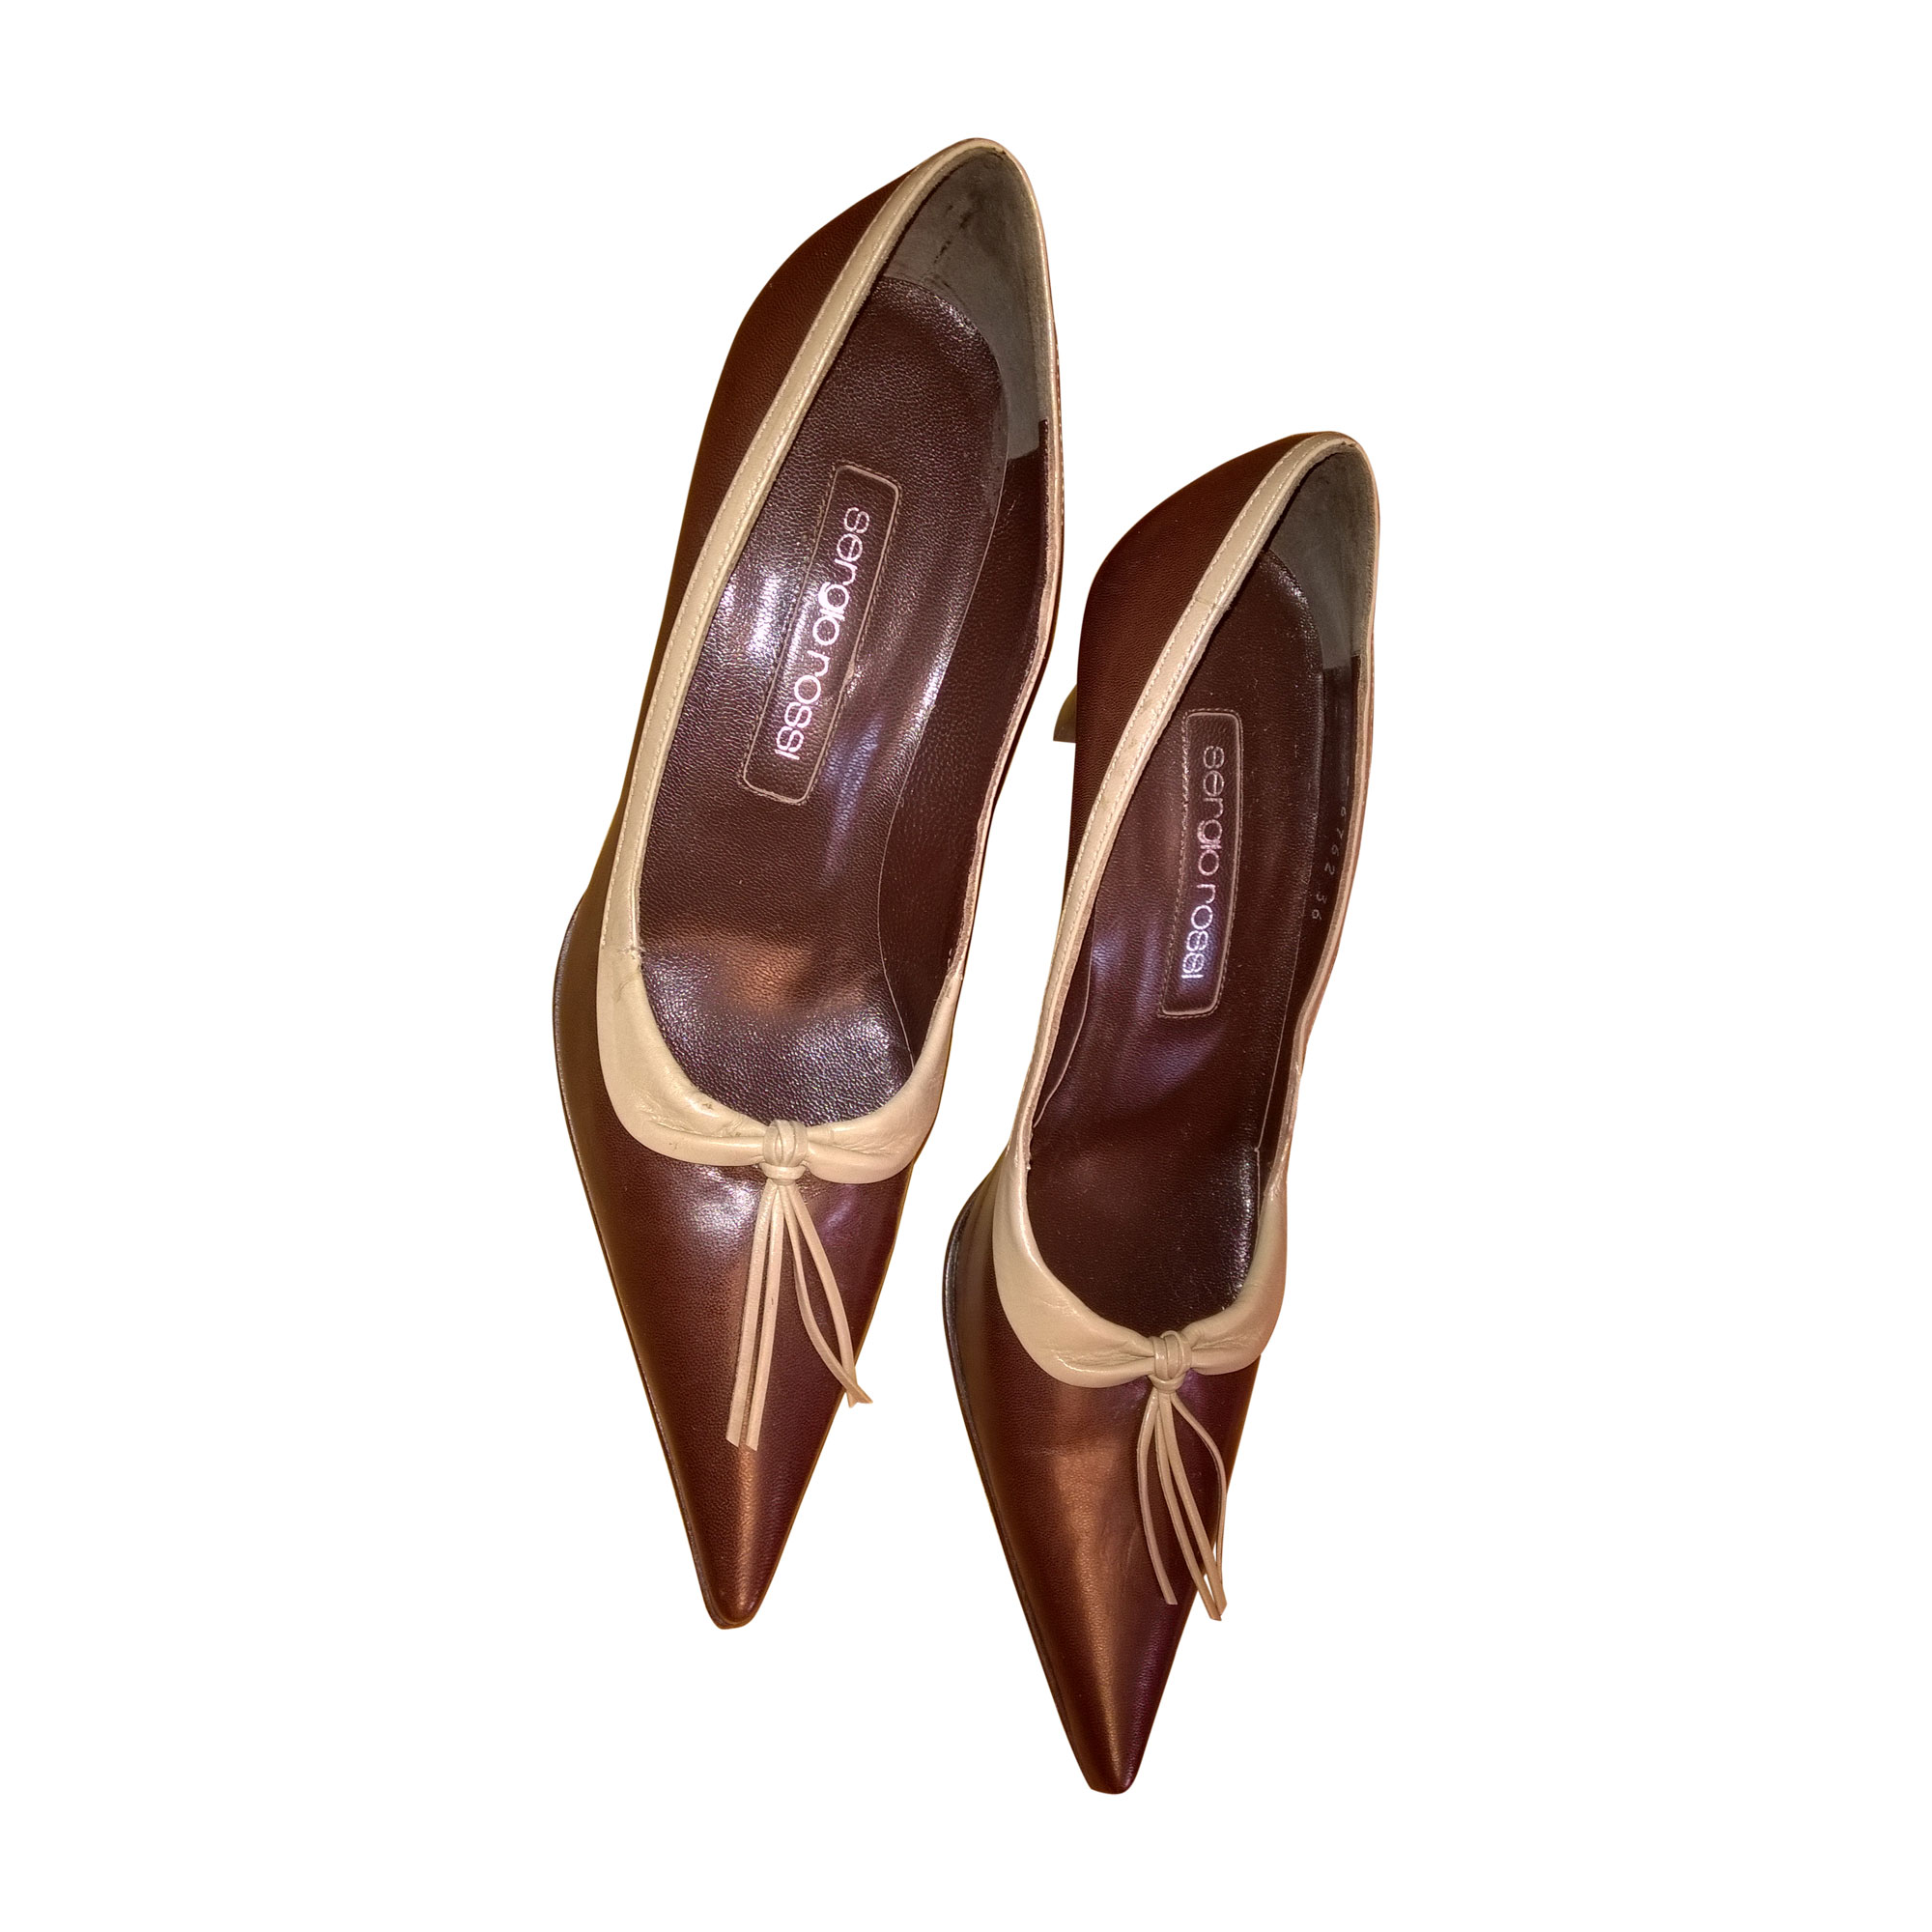 Chaussures de danse  SERGIO ROSSI Marron